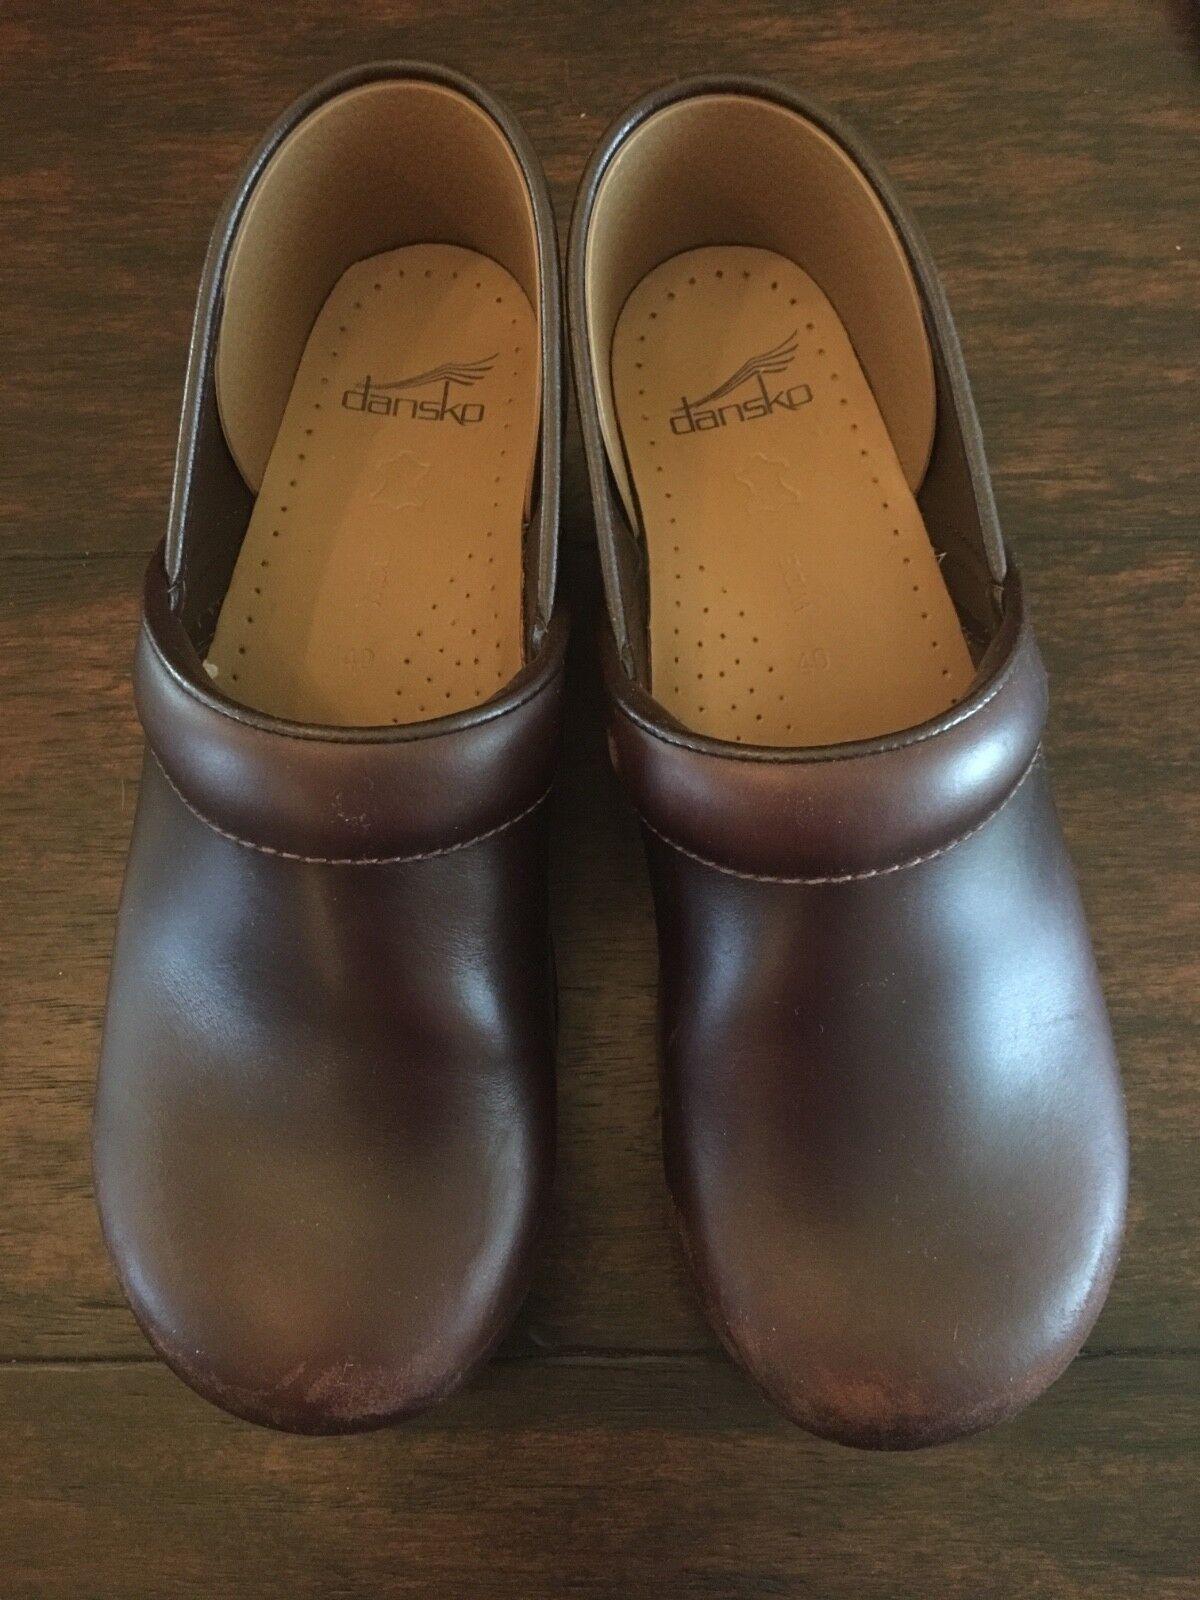 Dansko PROFESSIONAL ANTIQUE BROWN Damenschuhe Leder Slip On Closed Back Clogs Schuhes